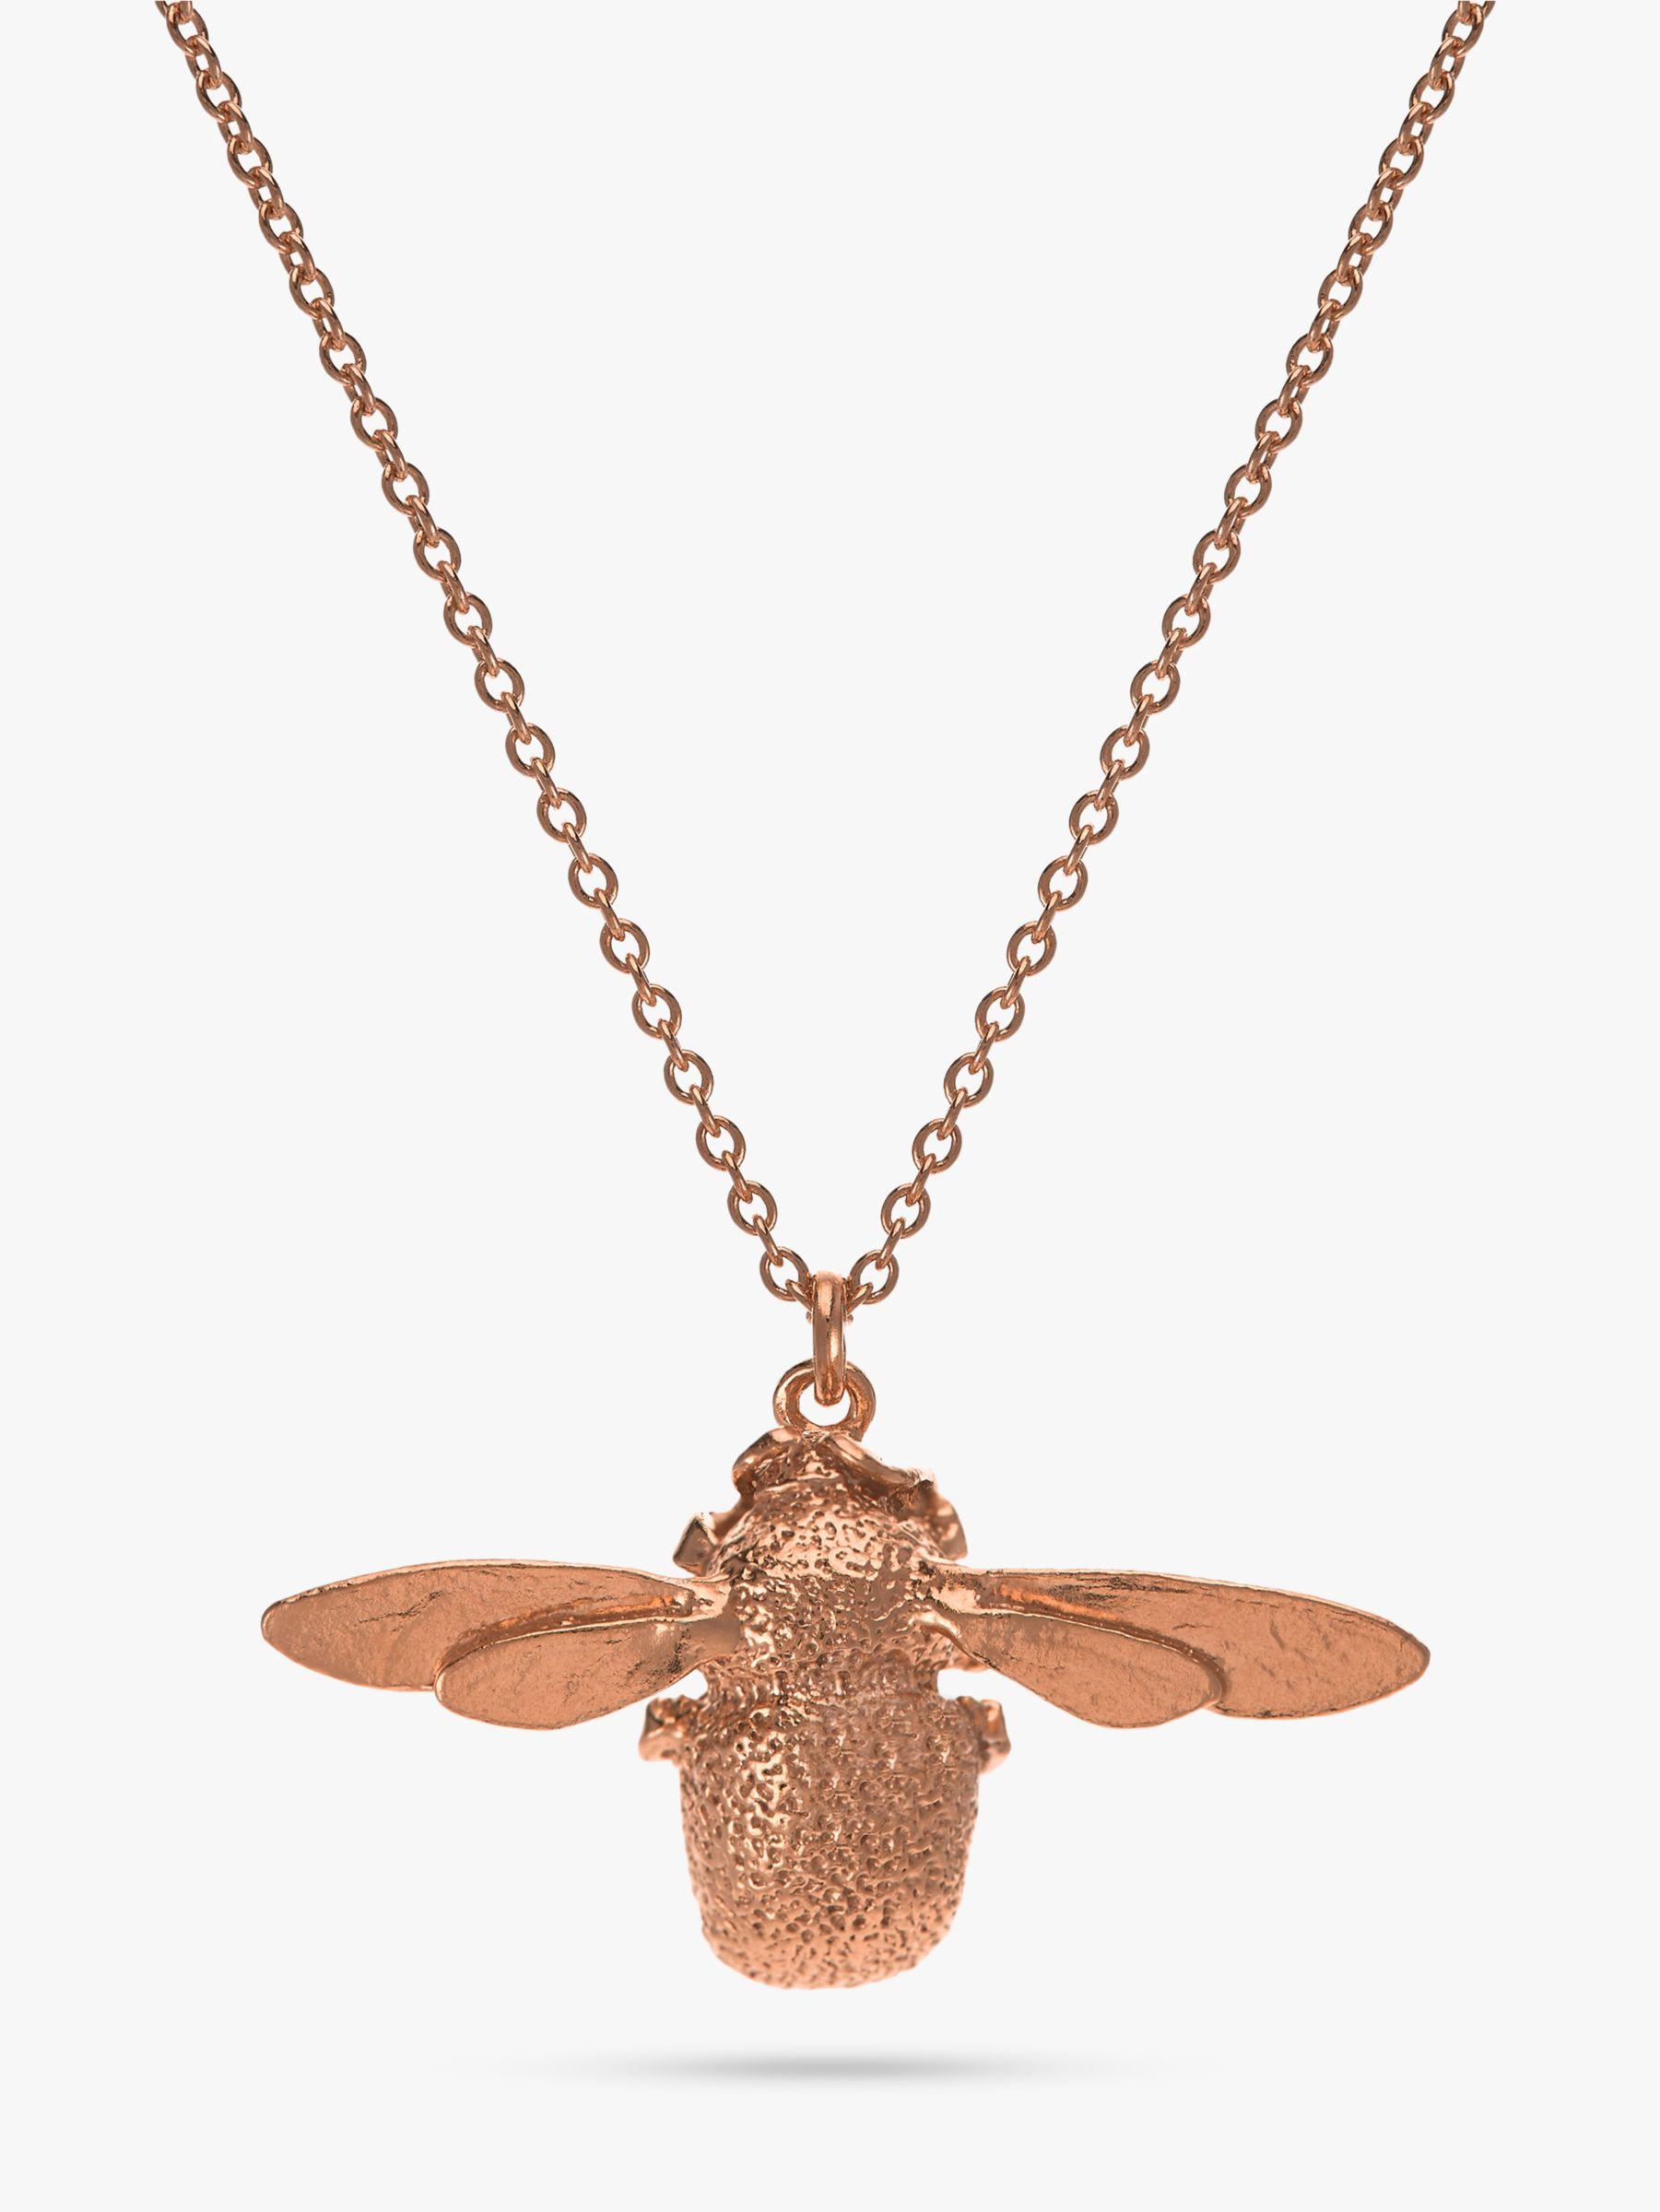 Alex Monroe 22ct Rose Gold Vermeil Bee Pendant Necklace, Rose Gold